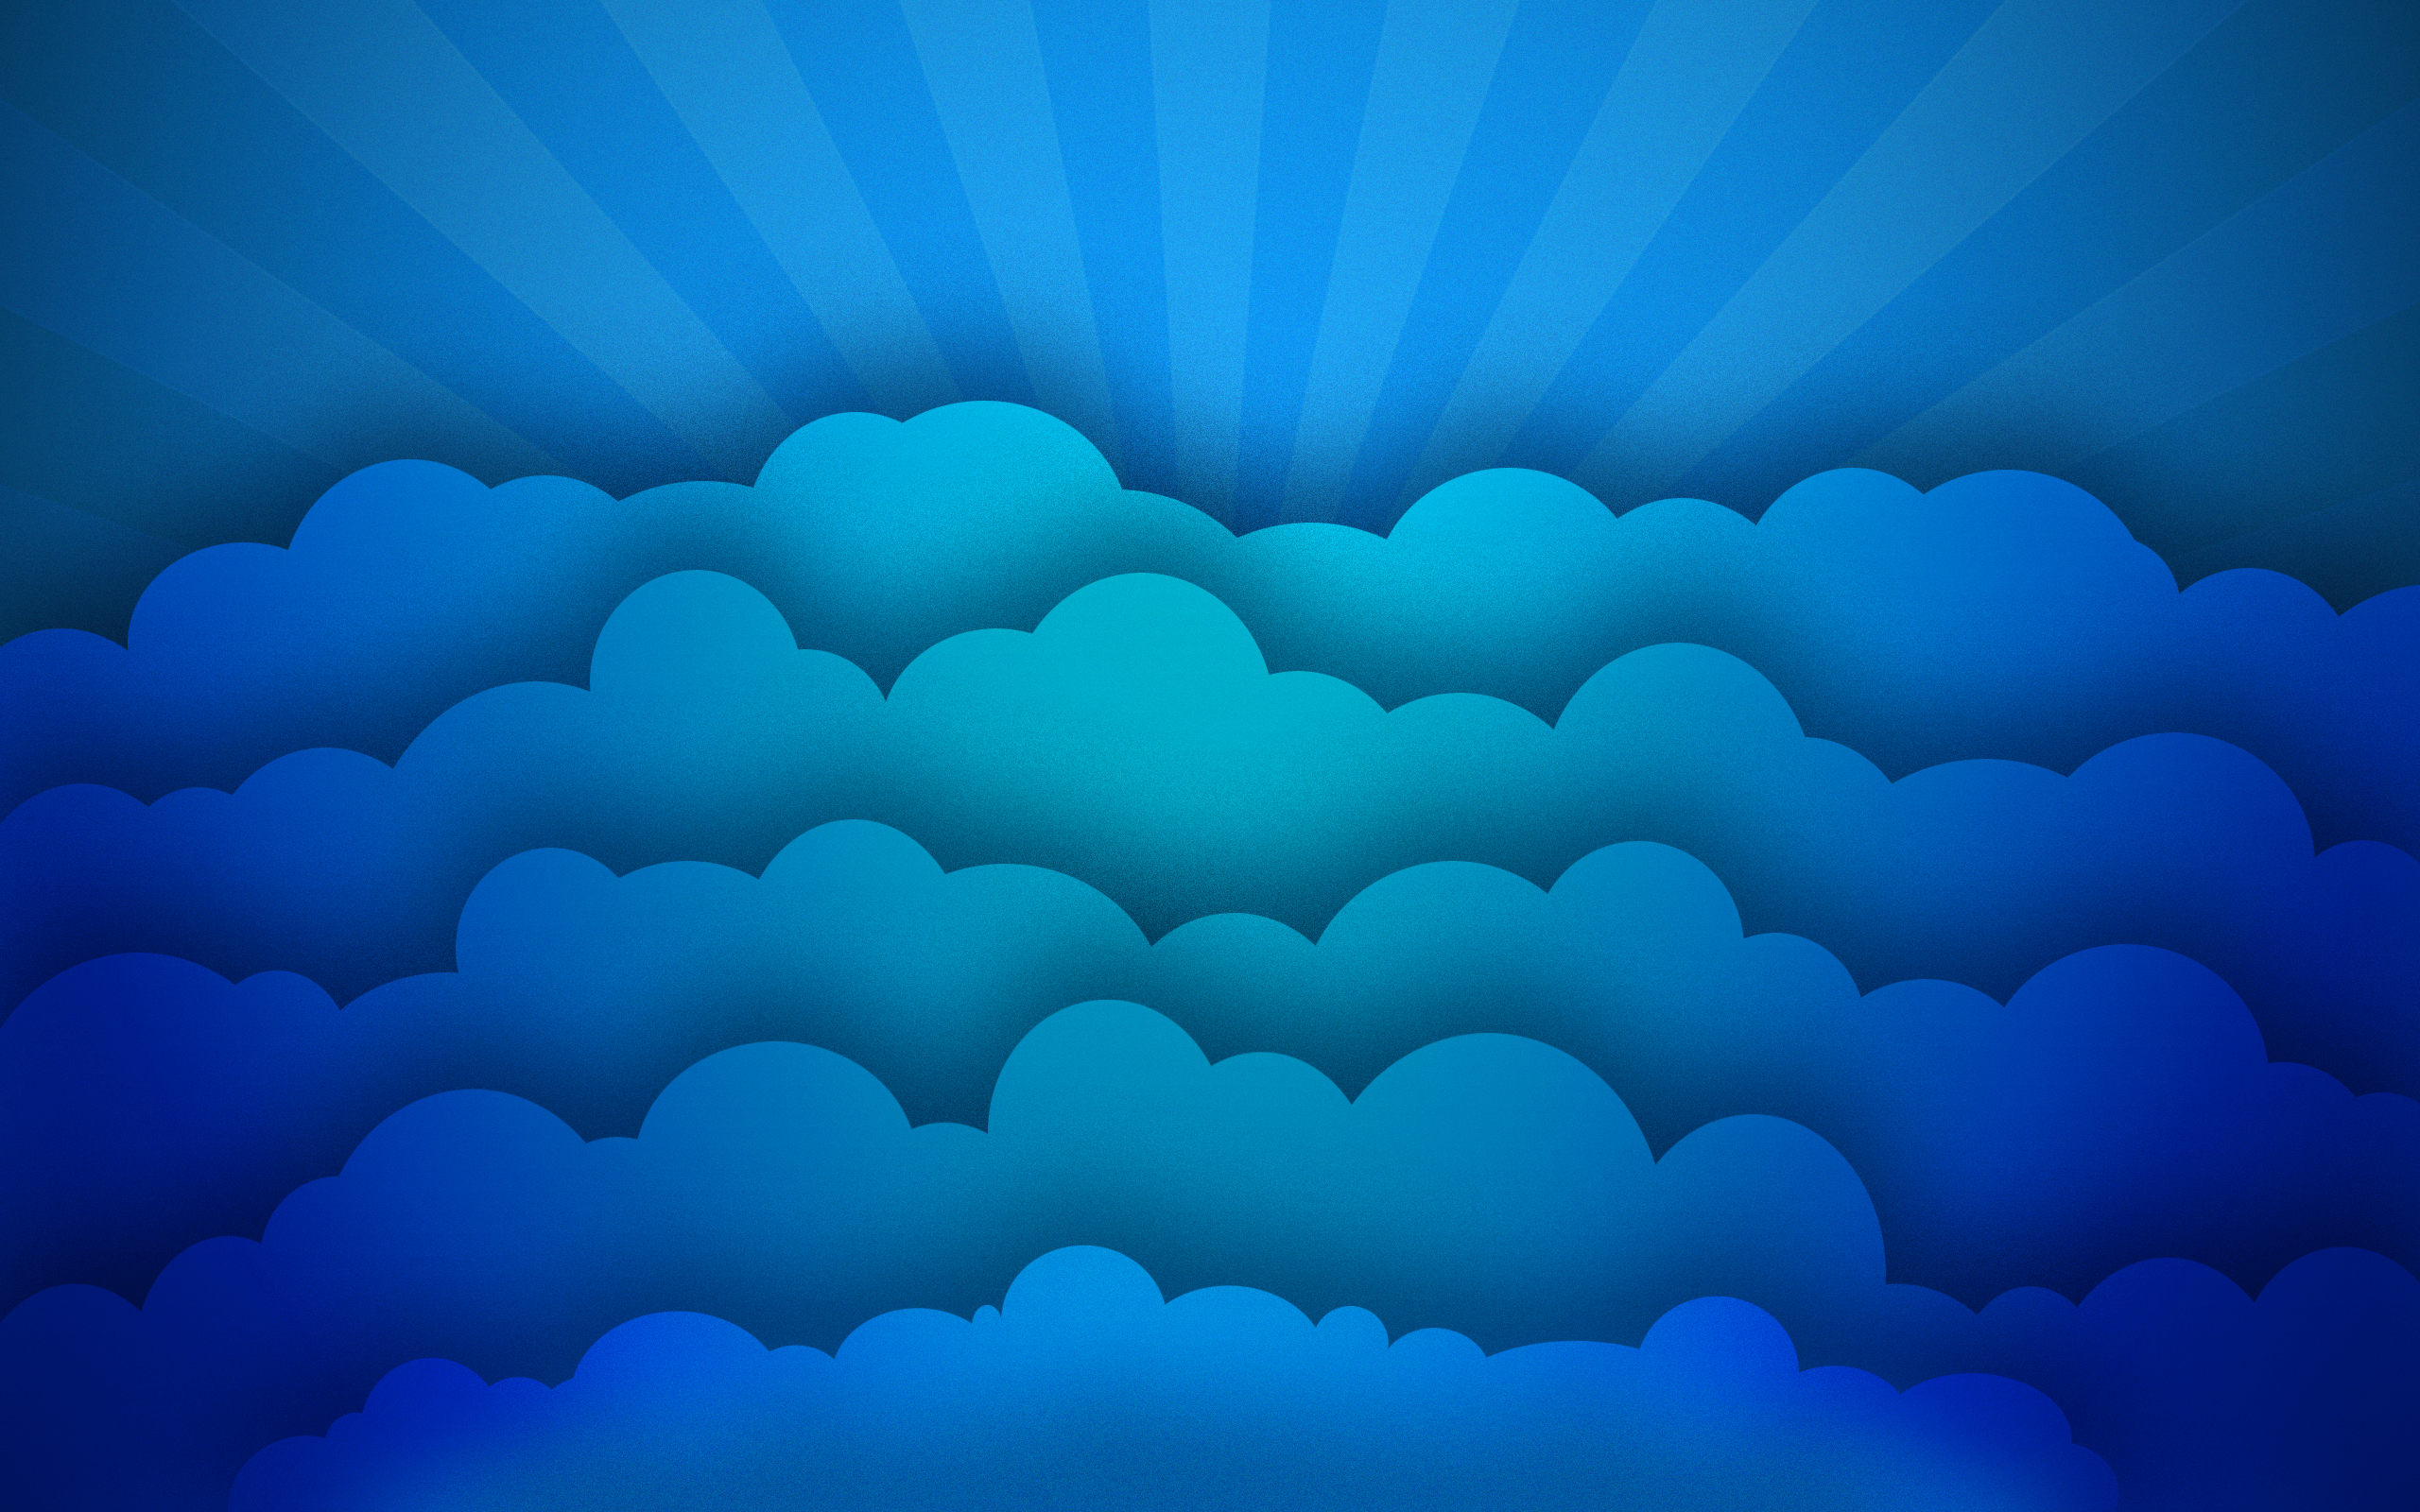 Cloudy Sky Wallpaper Clipart.